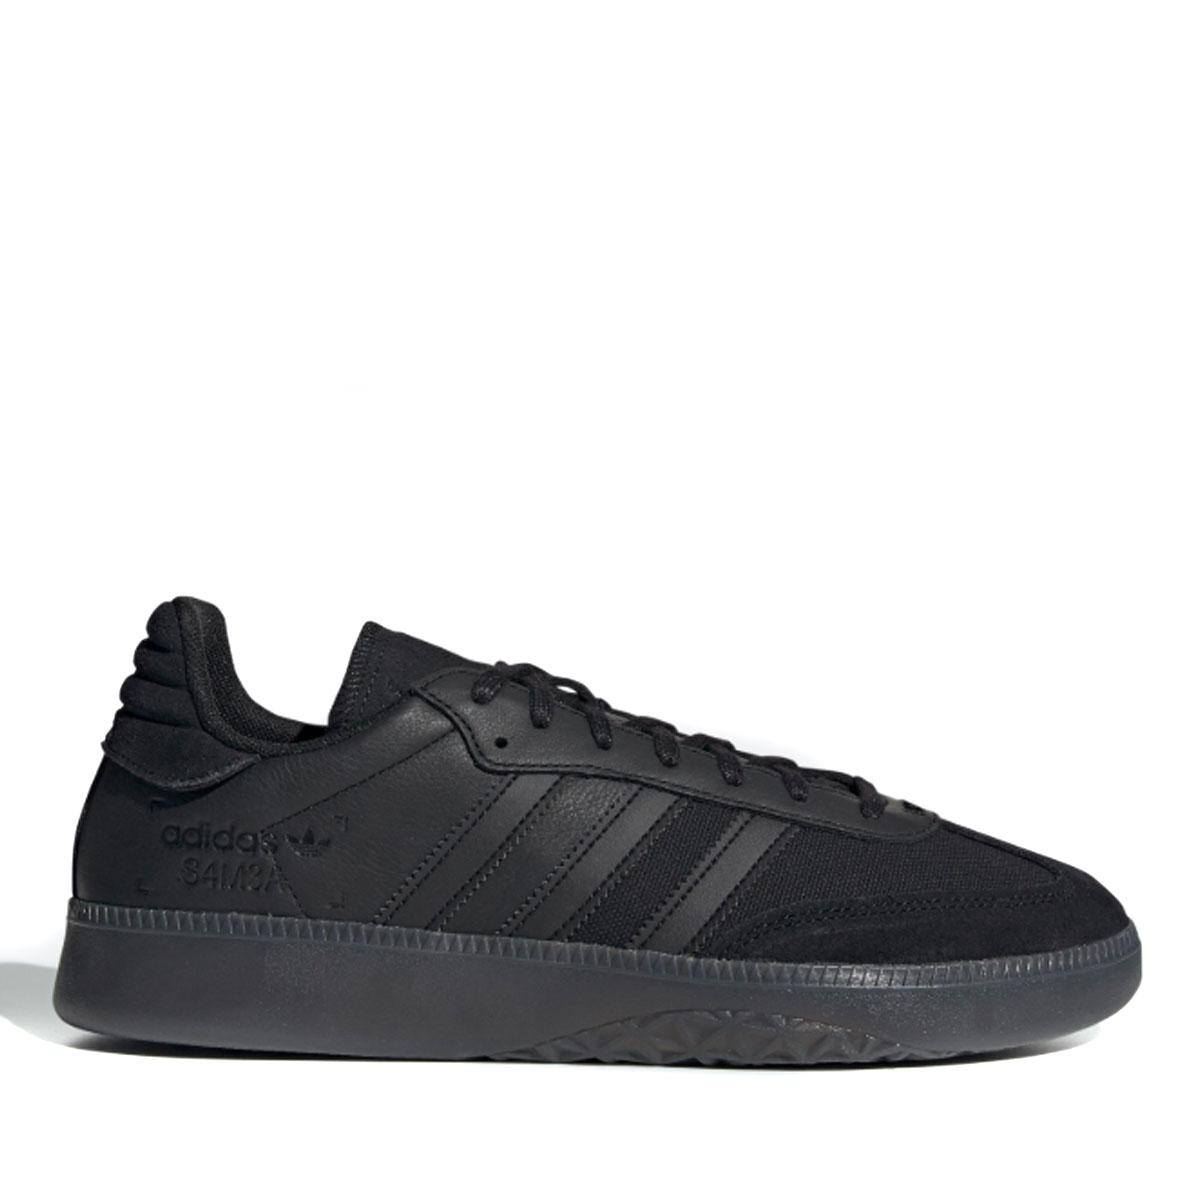 adidas Originals SAMBA RM (アディダスオリジナルス サンバ RM)CORE BLACK/CORE BLACK/FTWR WHITE【メンズ スニーカー】19SS-I